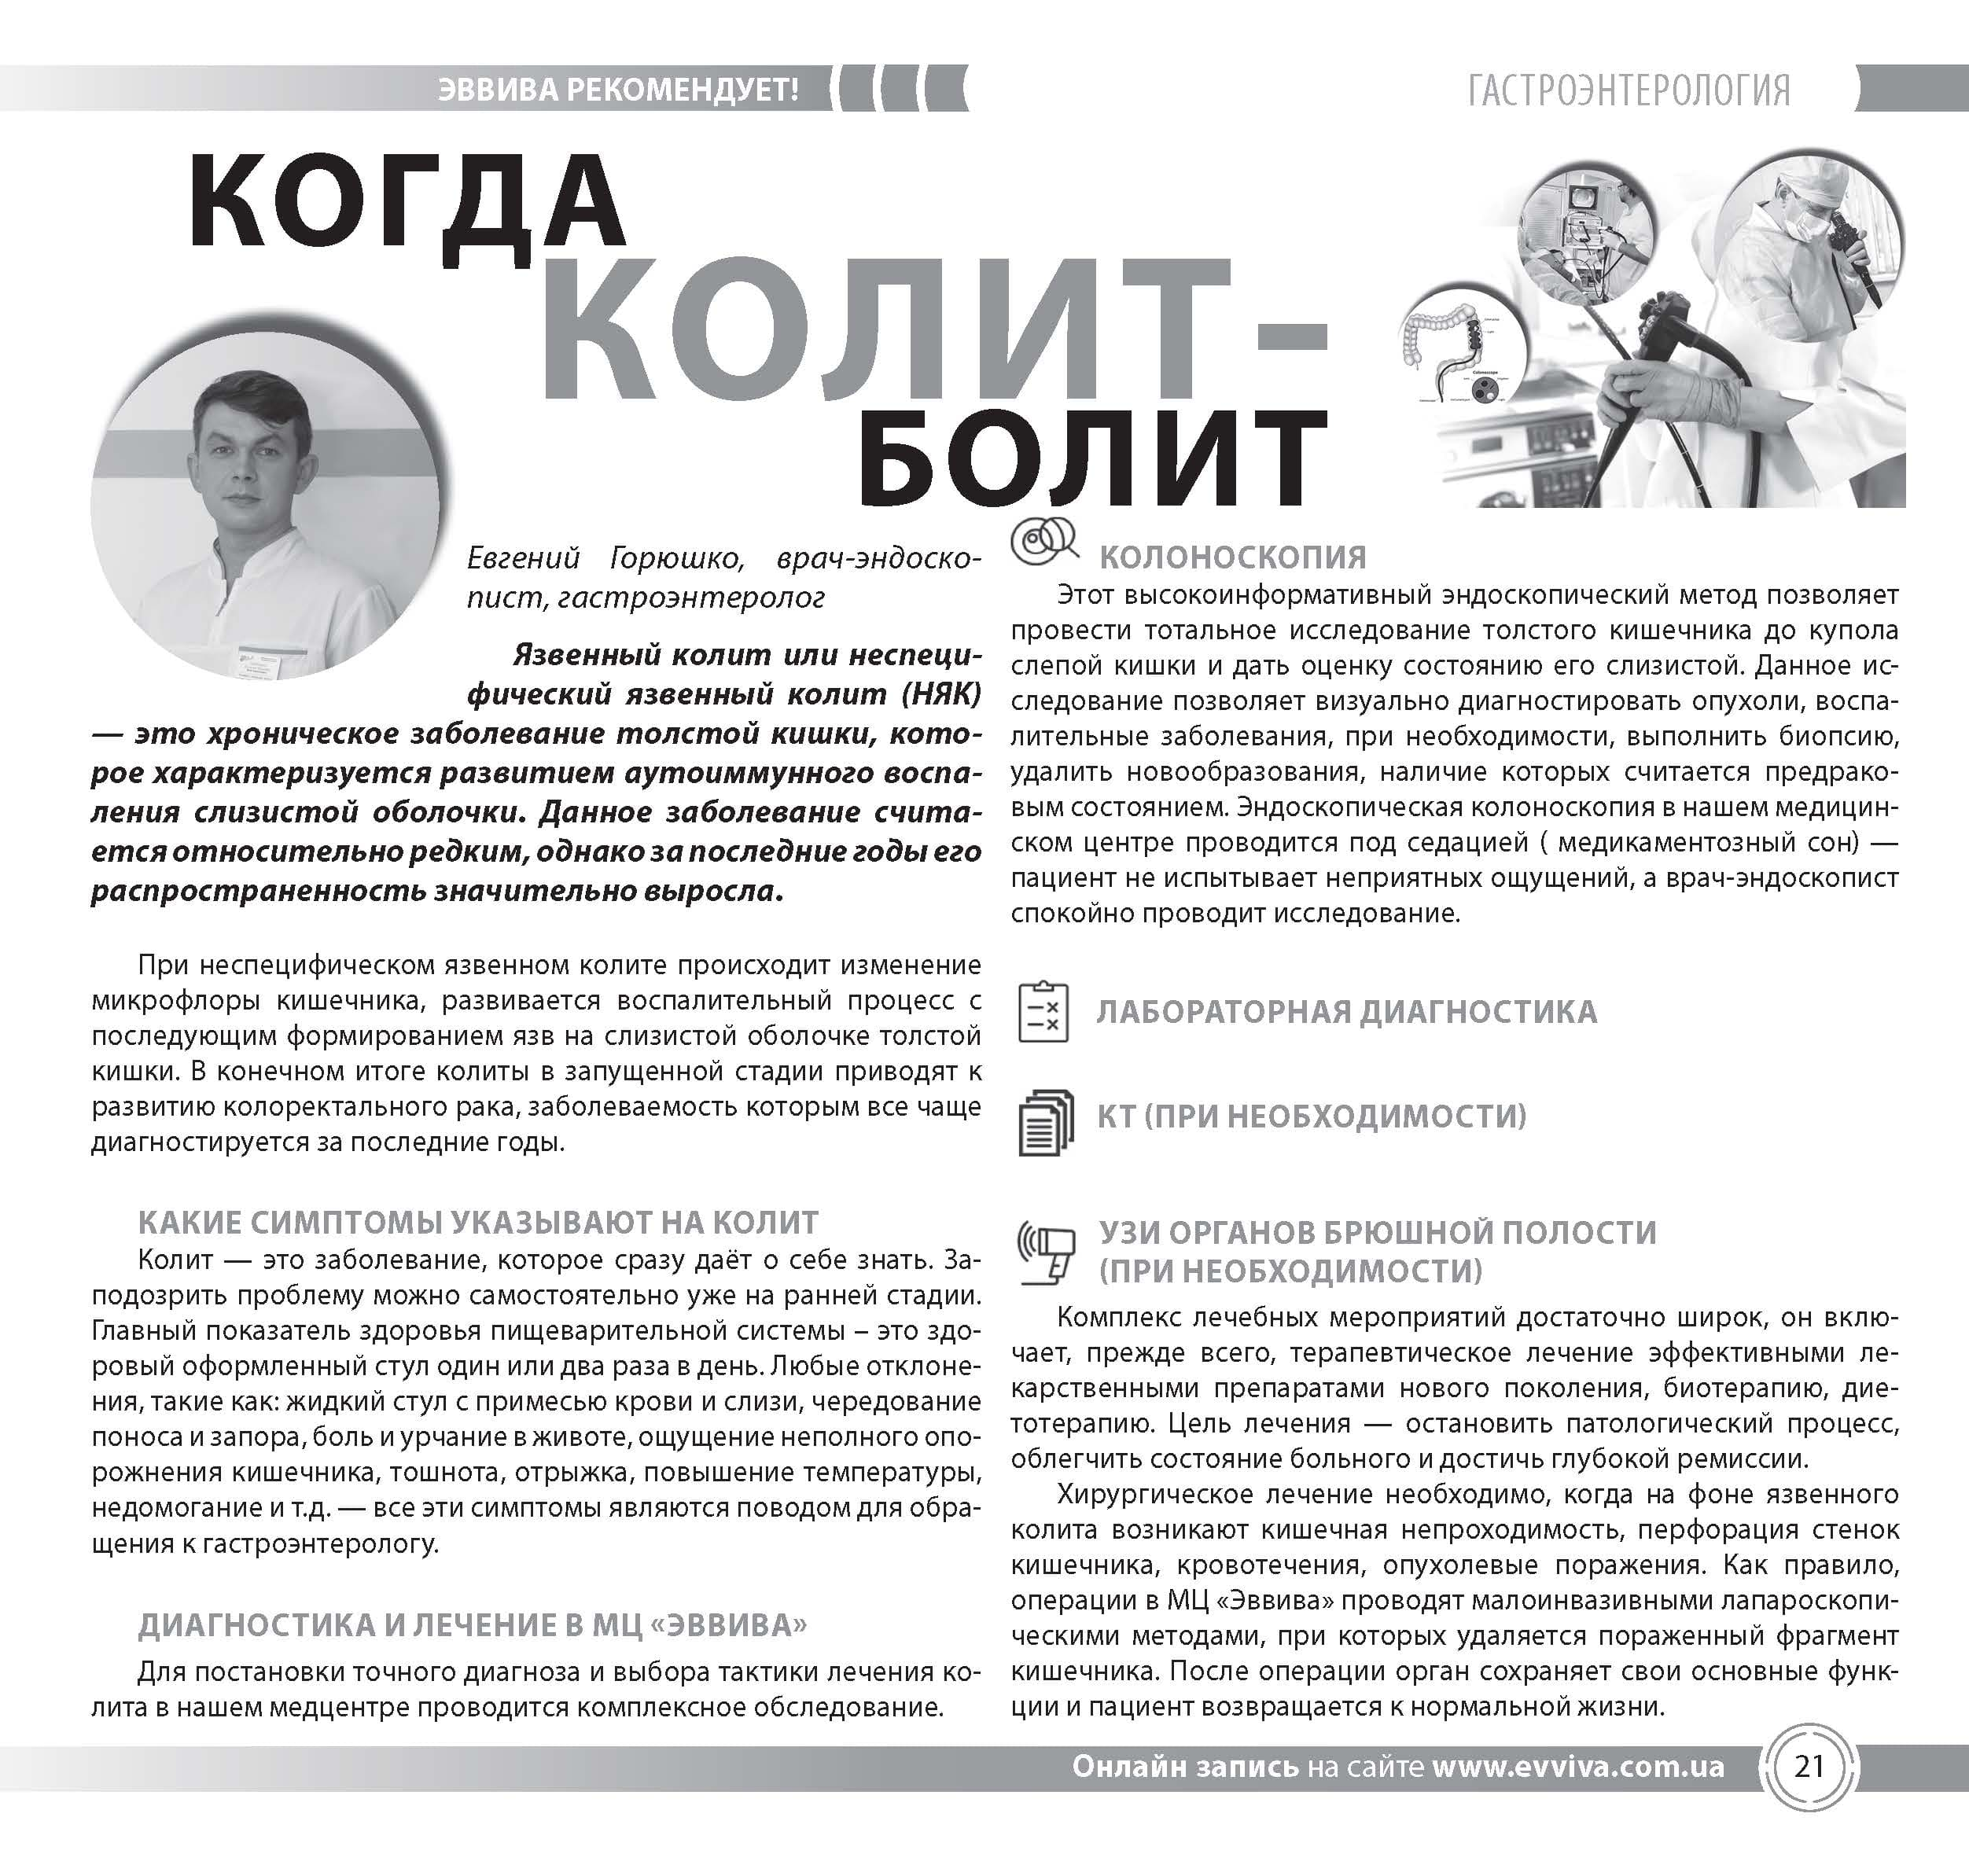 evviva-zhurnal-119-page21